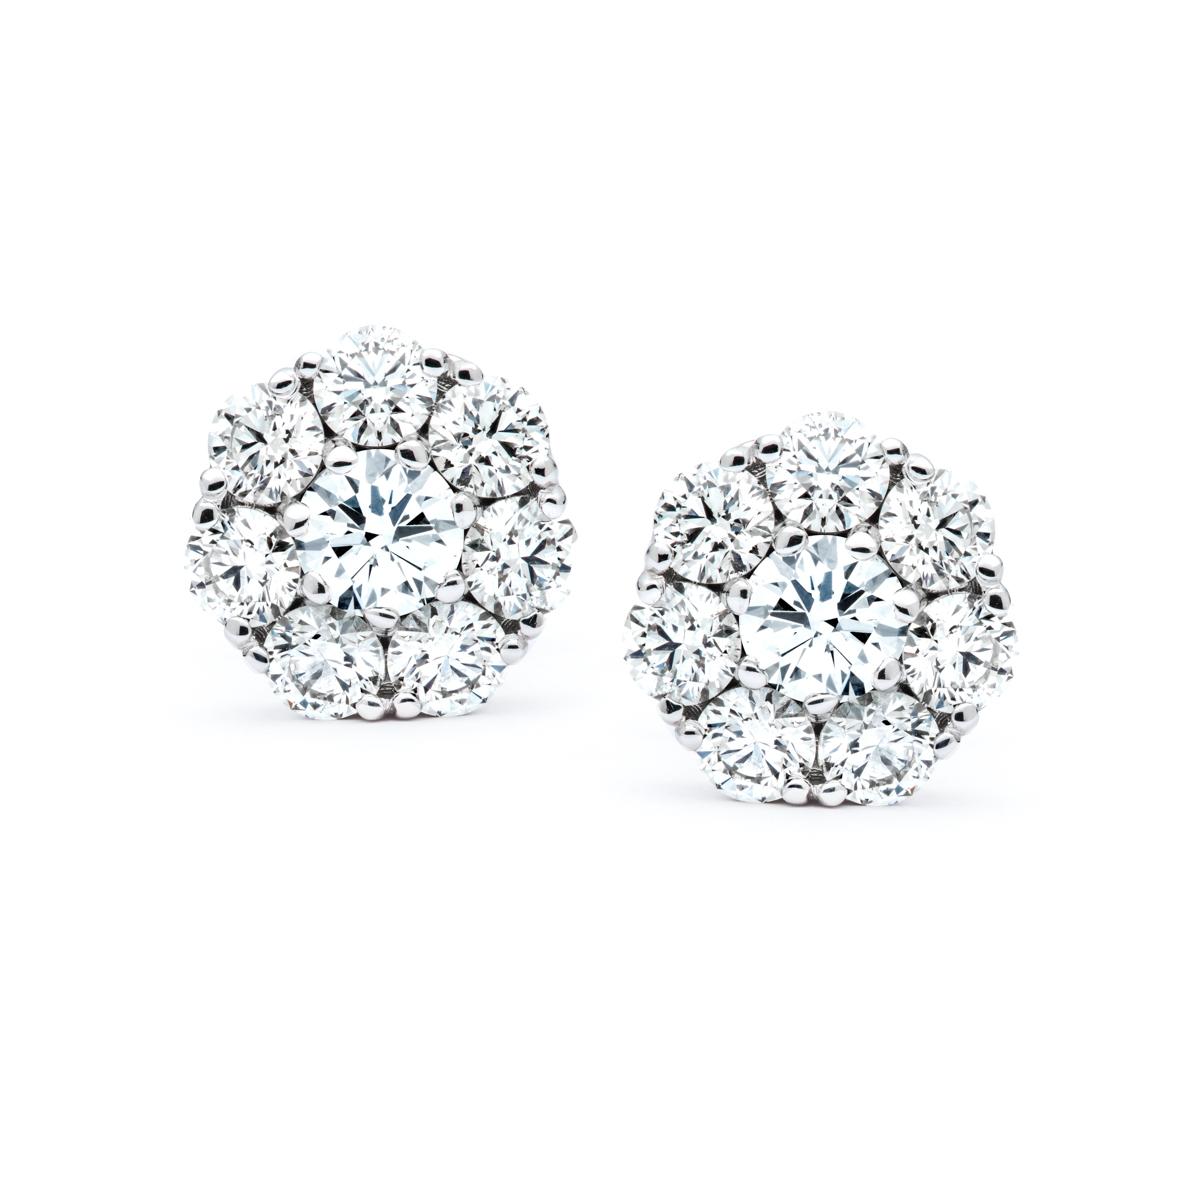 White Gold Diamond Cluster Earrings Jm Edwards Jewelry